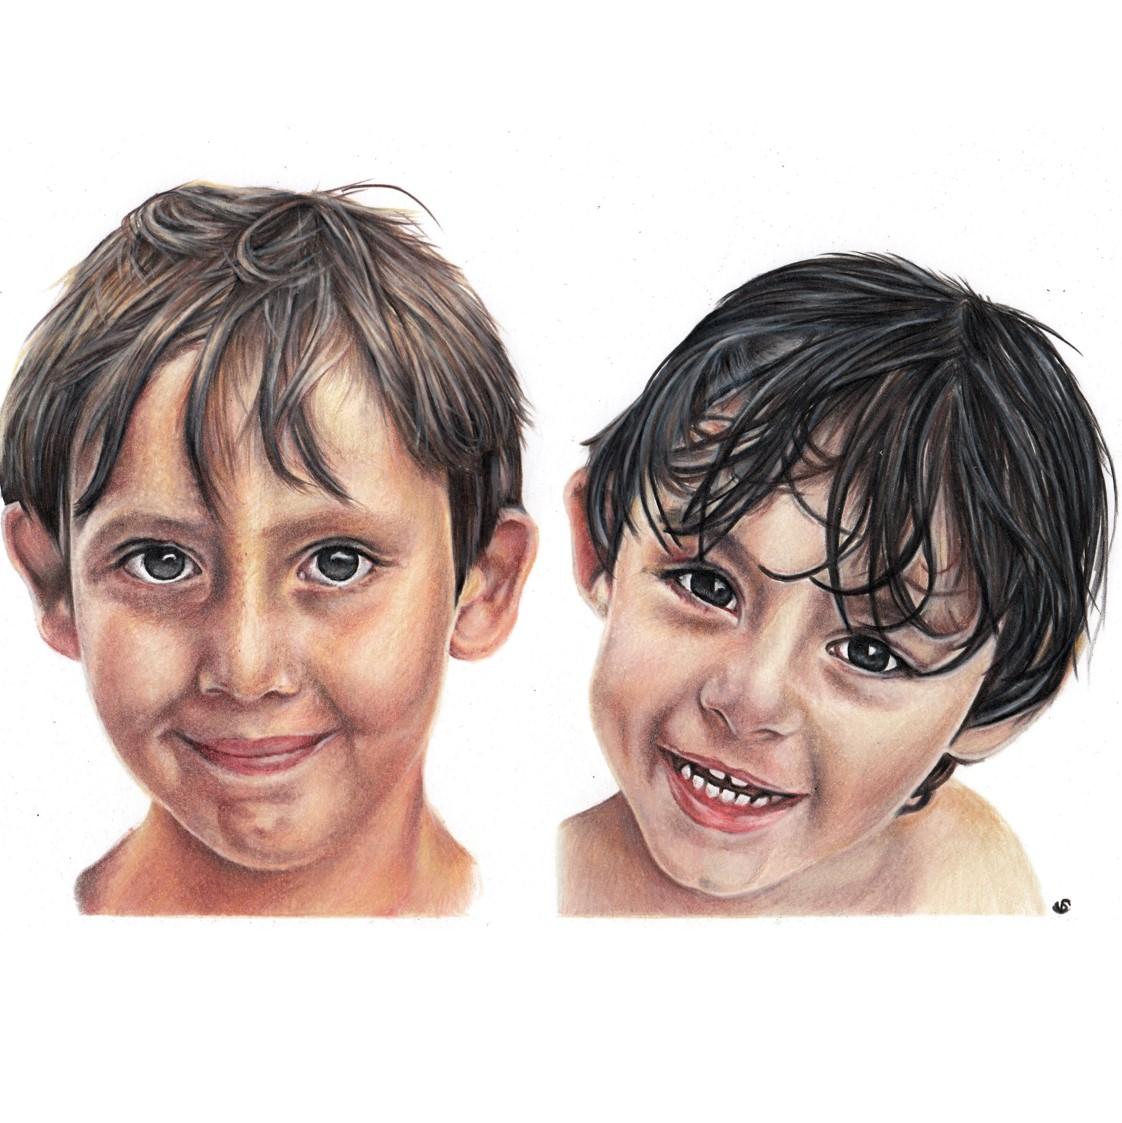 'Sami & Ryaz' - UK, 8.5 x 11.7 in, 2017, Colour Pencil Children Portrait by Sema Martin